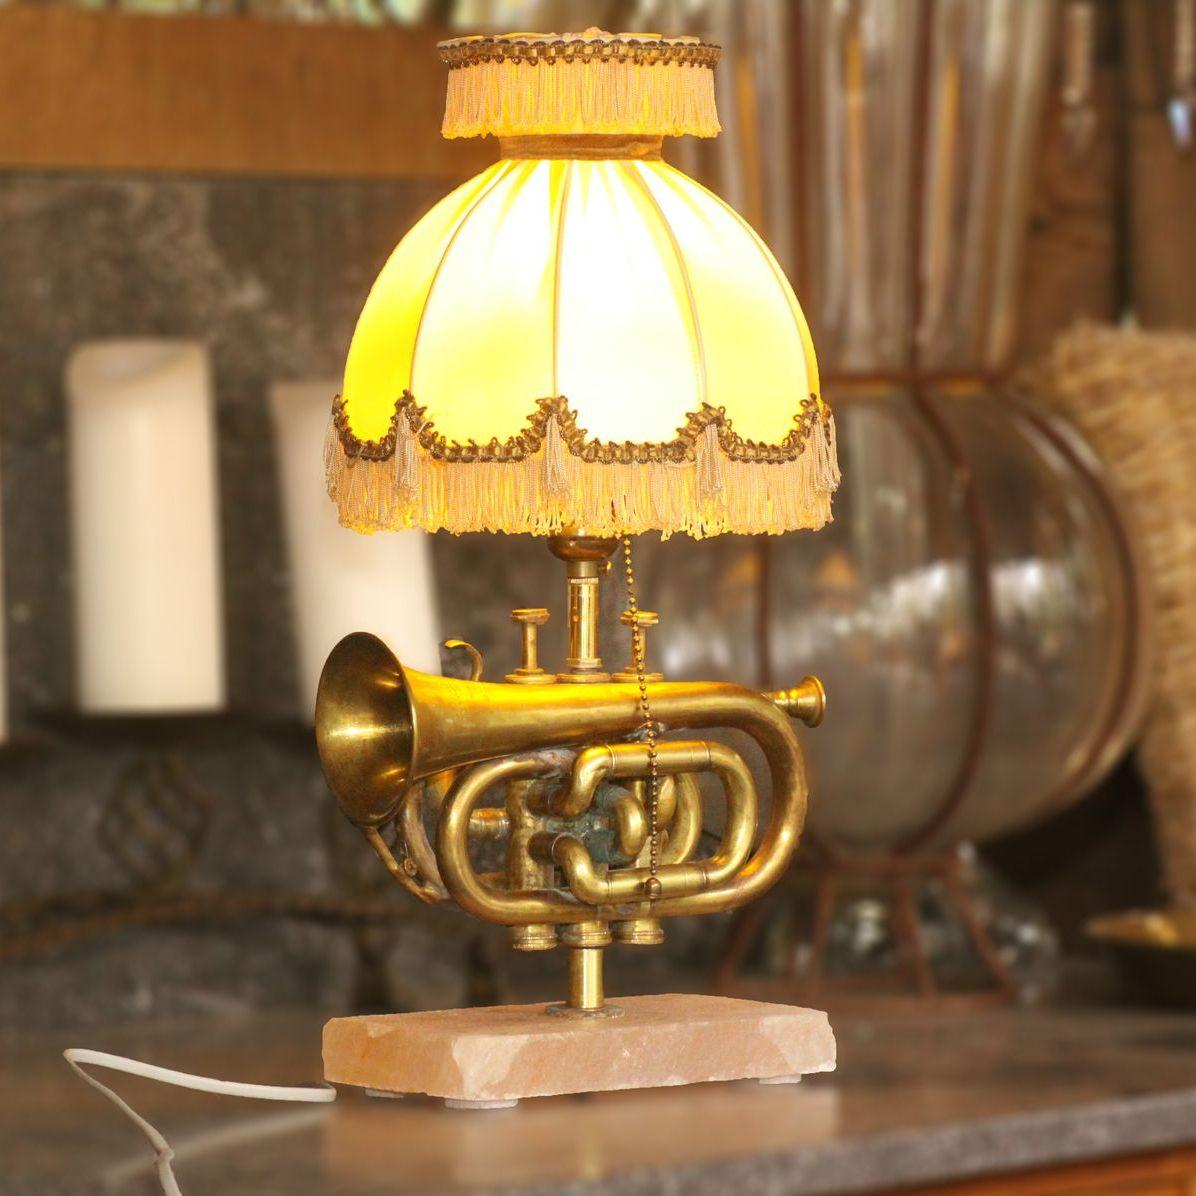 Trumpet lamp table lamp salt block fringes vintage retro 32